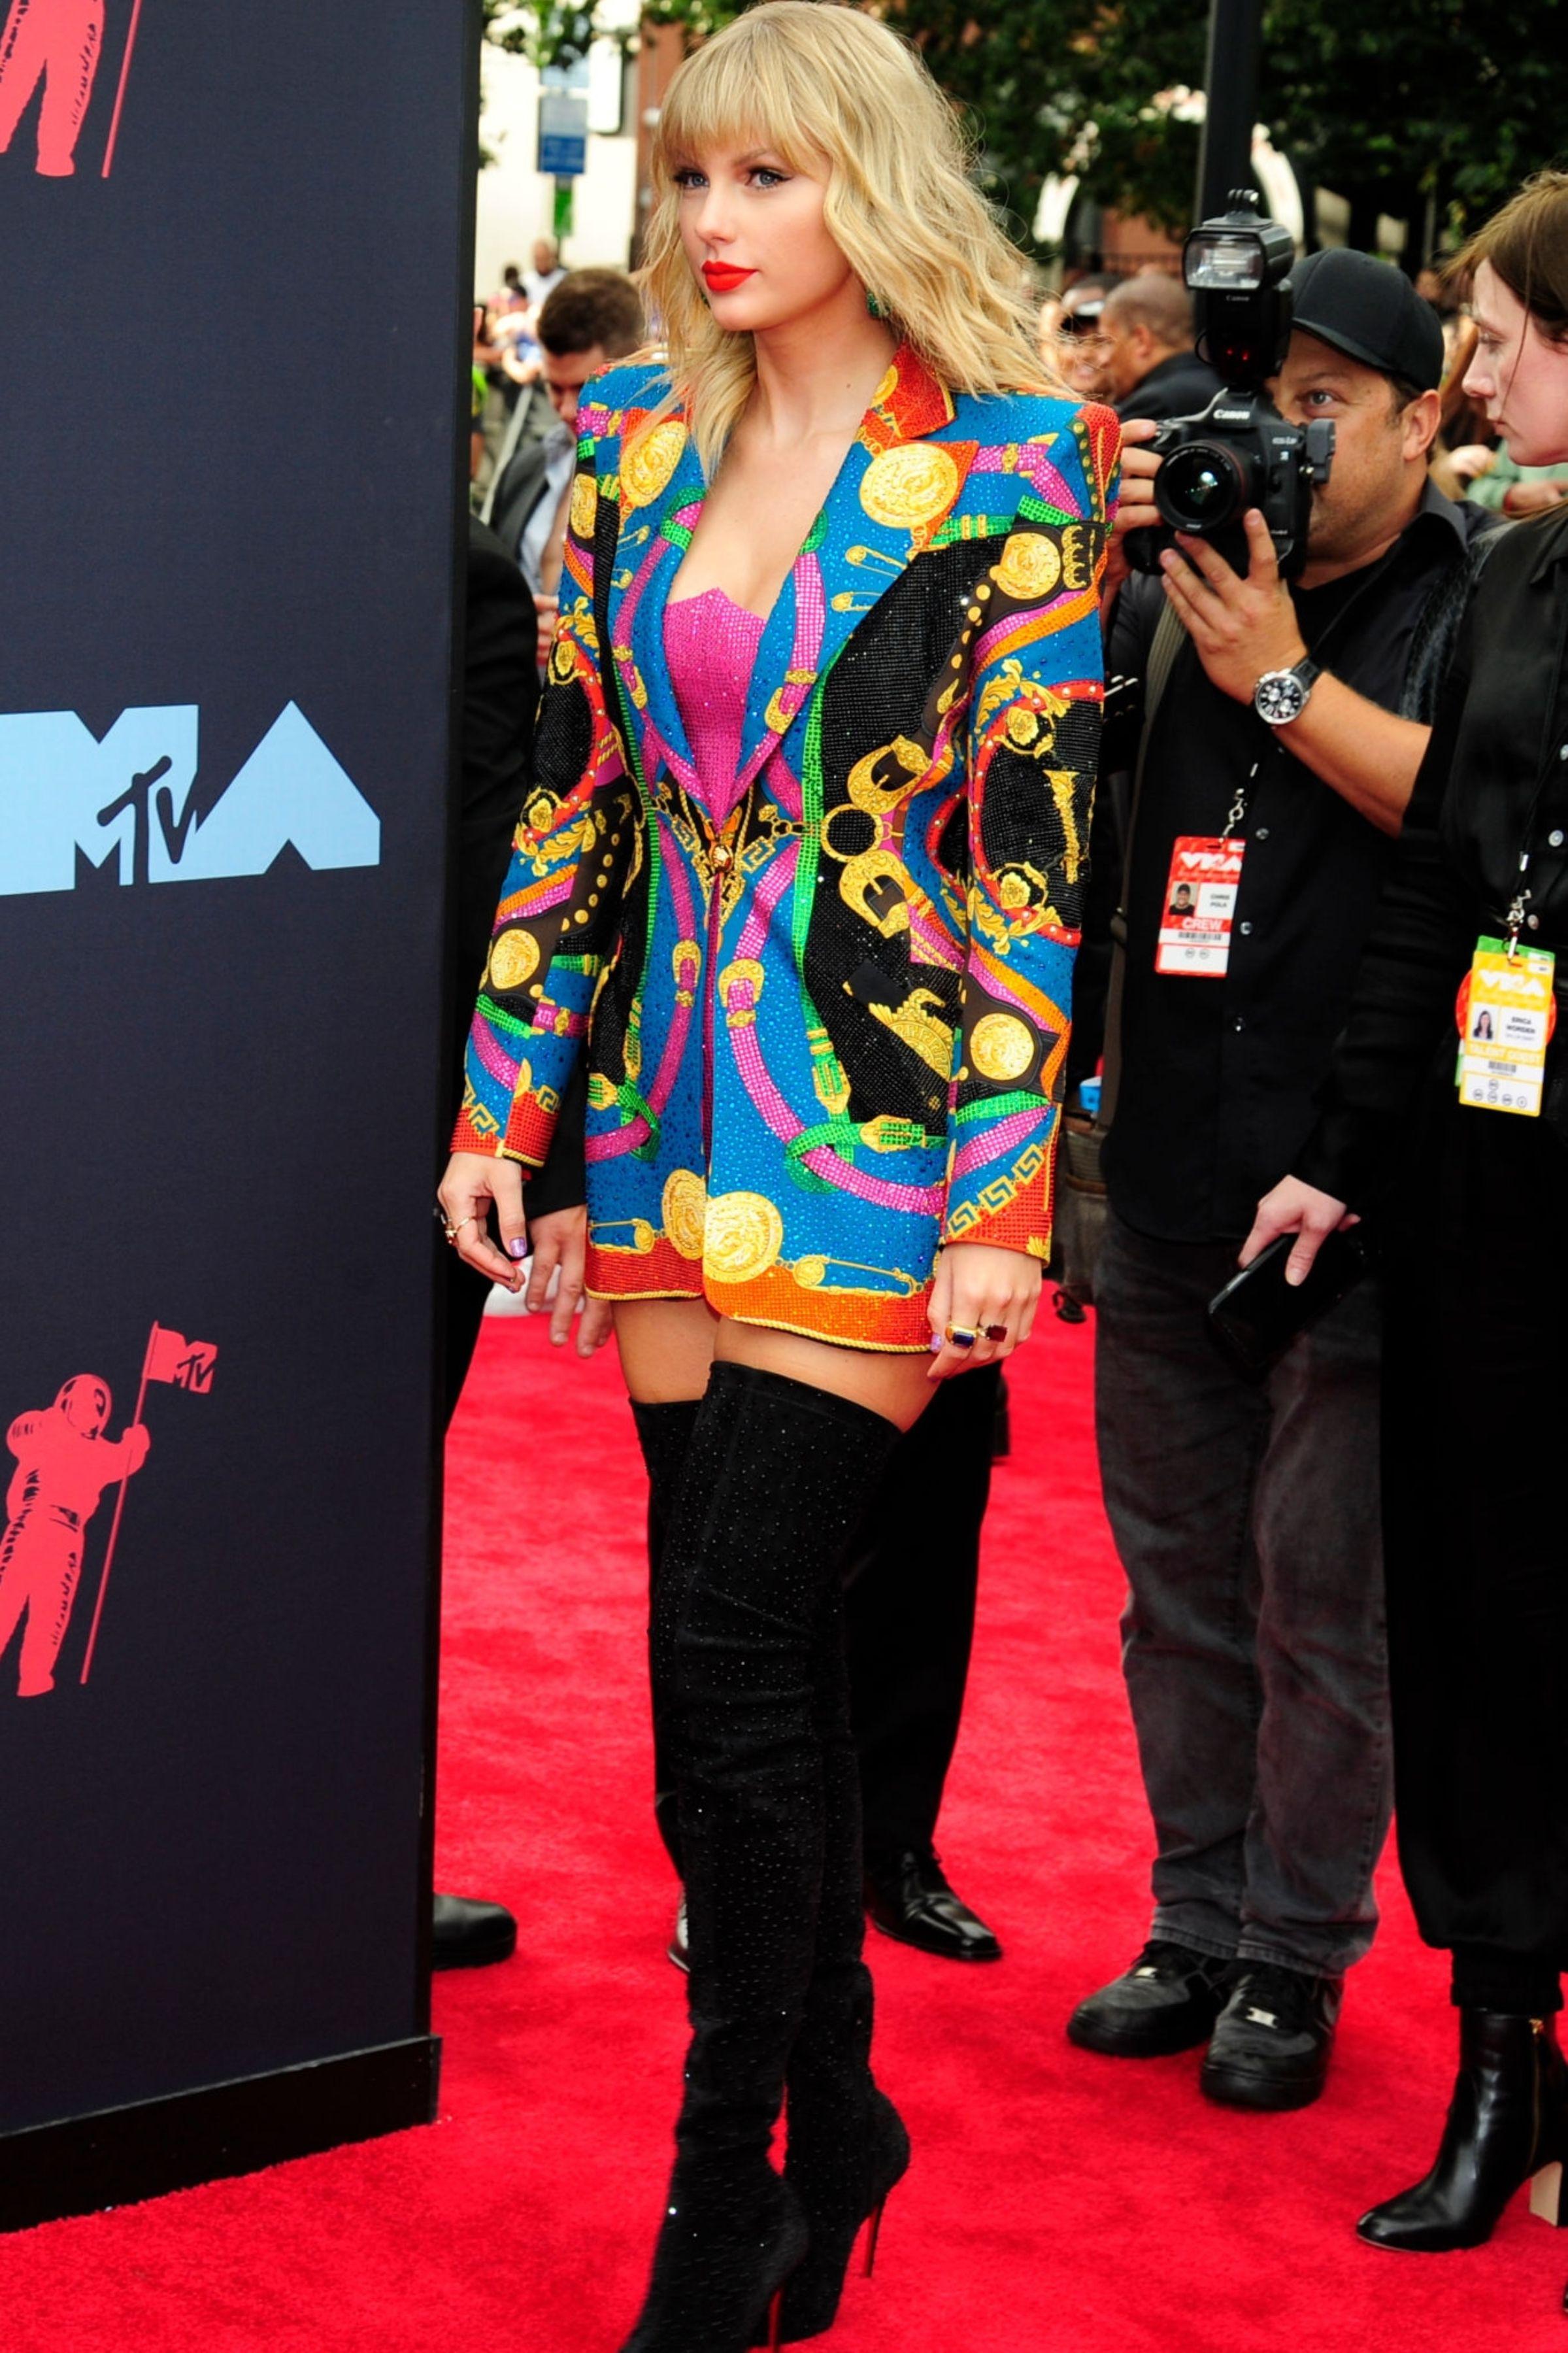 2019 MTV Video Music Awards - 004 - Taylor Swift Web Photo ...